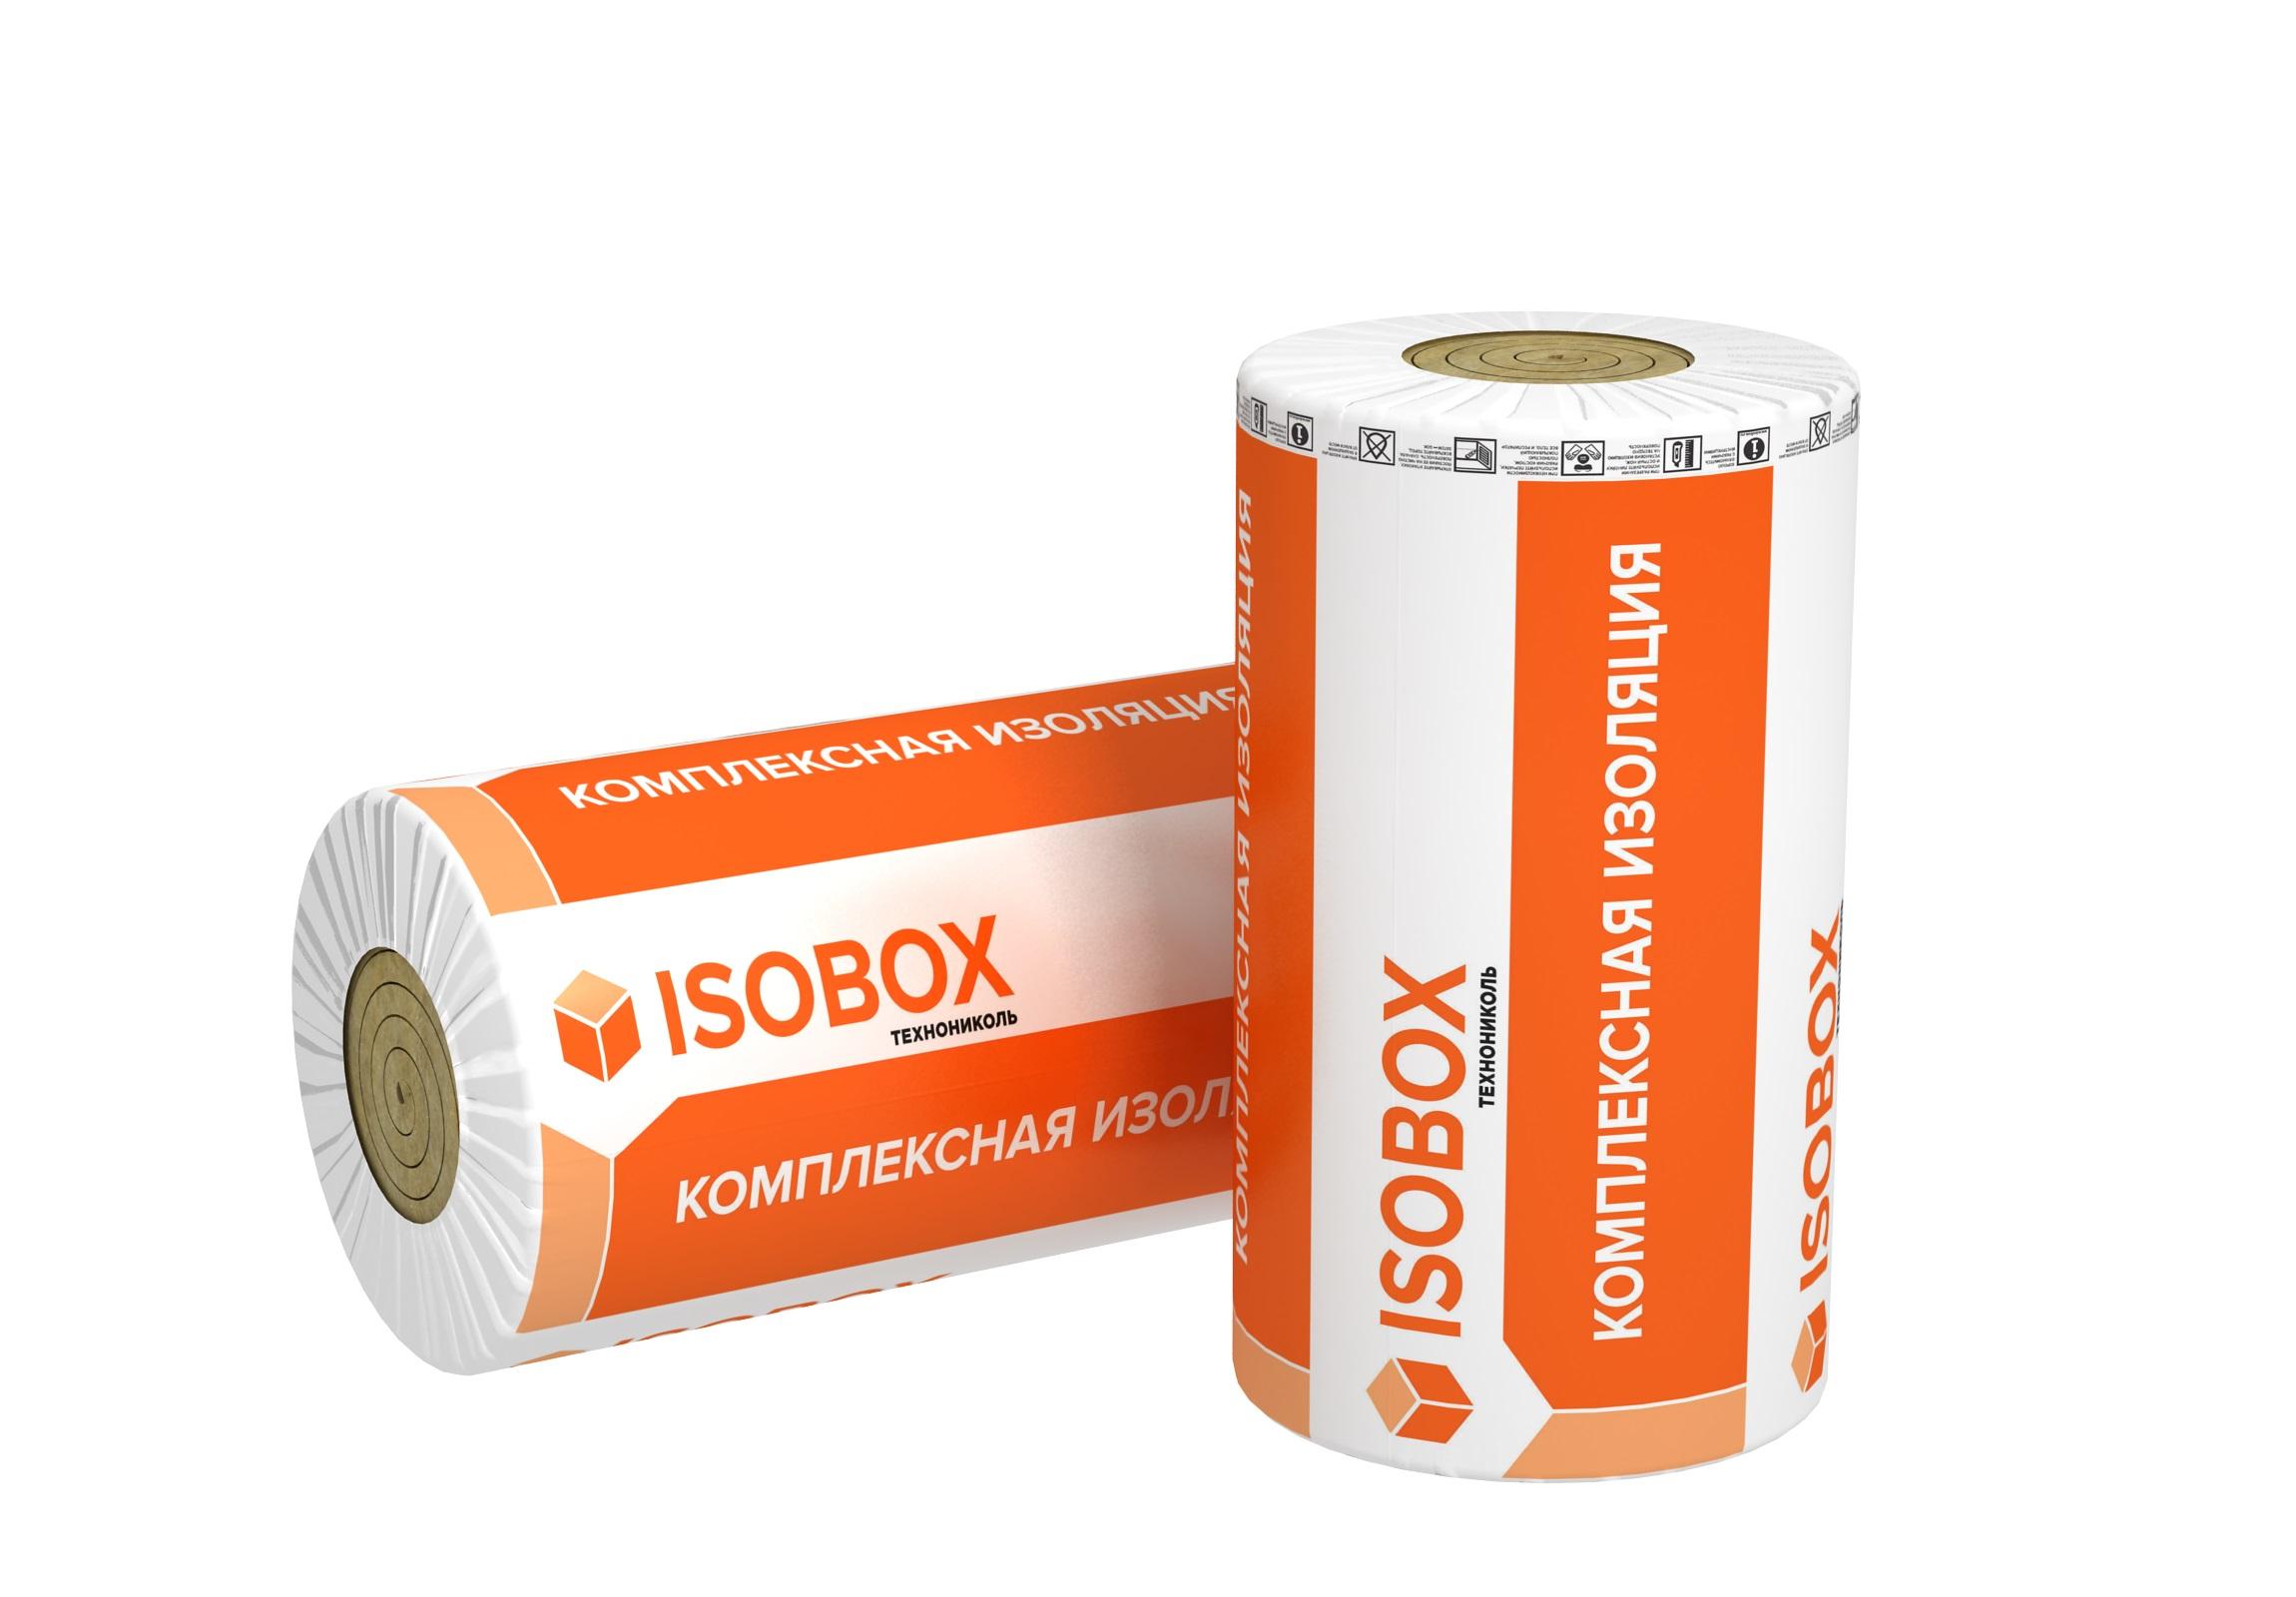 Базальтовая вата Isobox Теплоролл 5000х1200х50 мм